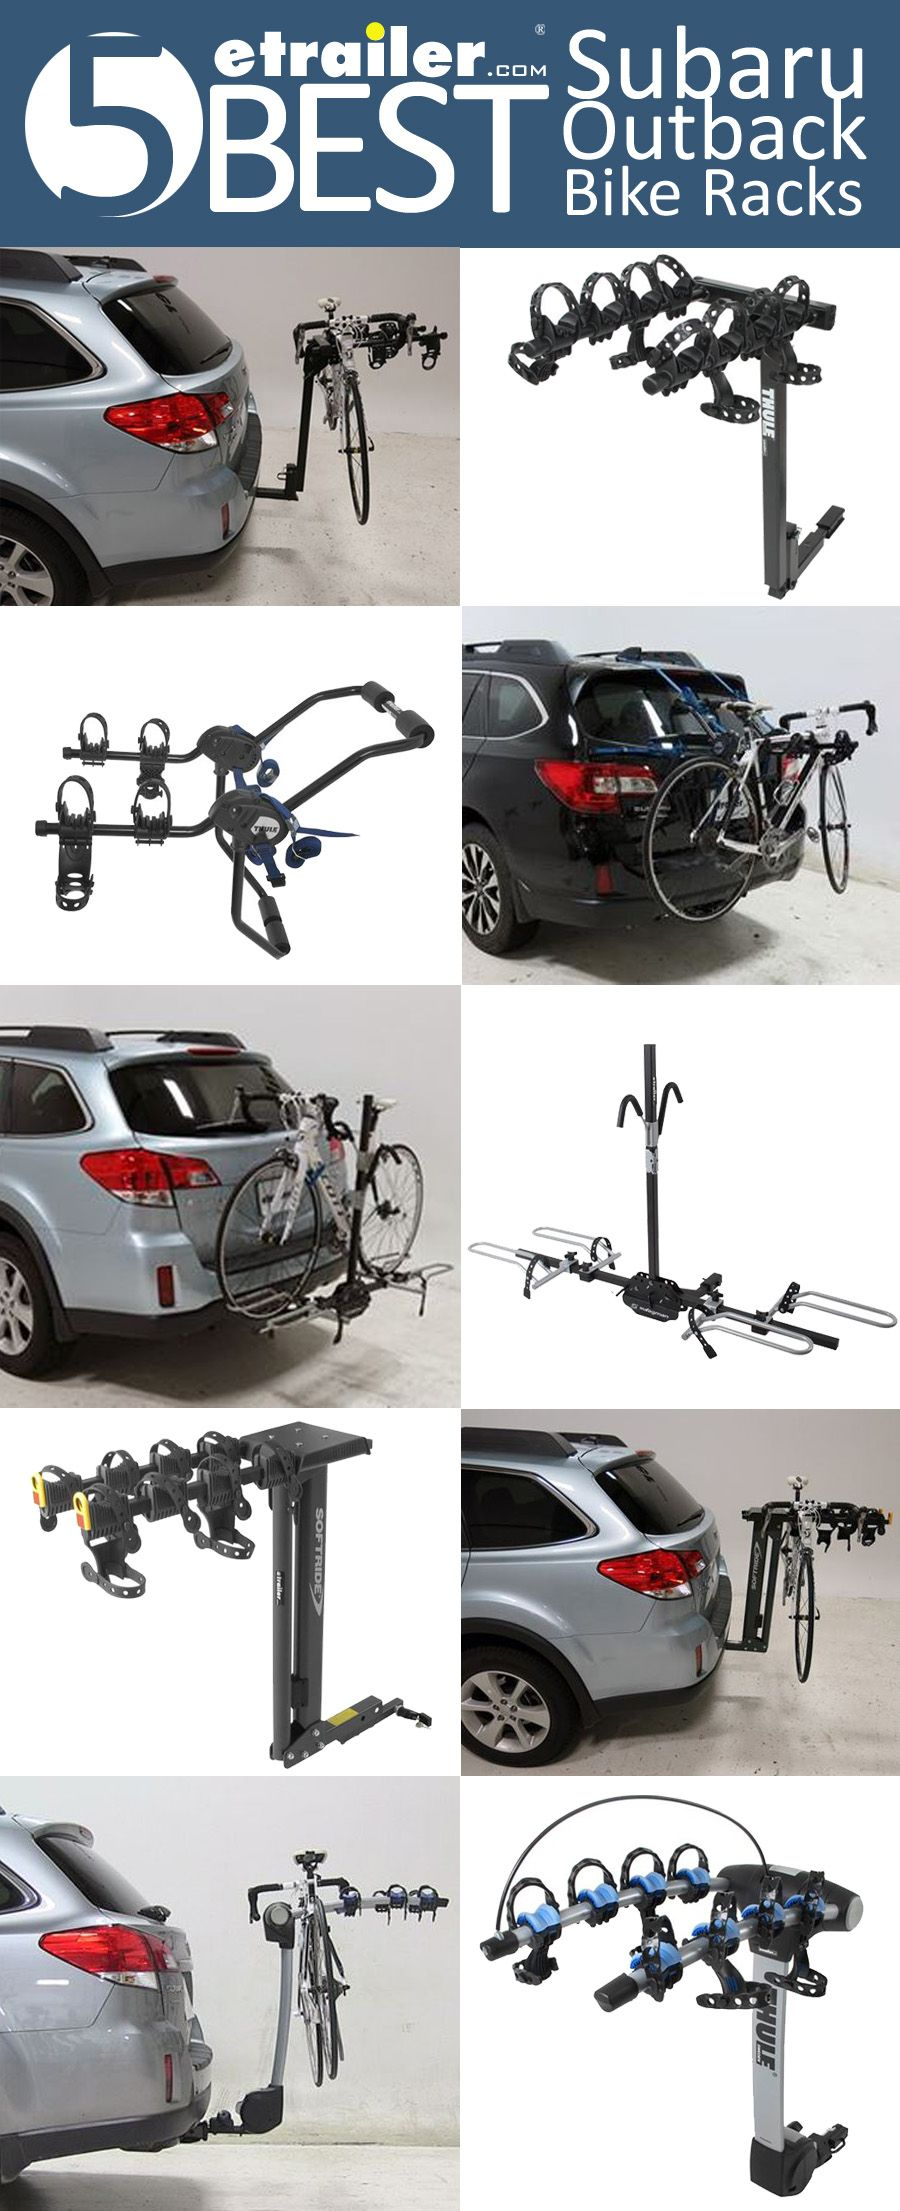 5 Best Subaru Outback Wagon Bike Racks Hitch And Hatch Bike Racks For Your Outback Racks For 2 To 4 Bikes Swingi Best Bike Rack Suv Bike Rack Subaru Outback